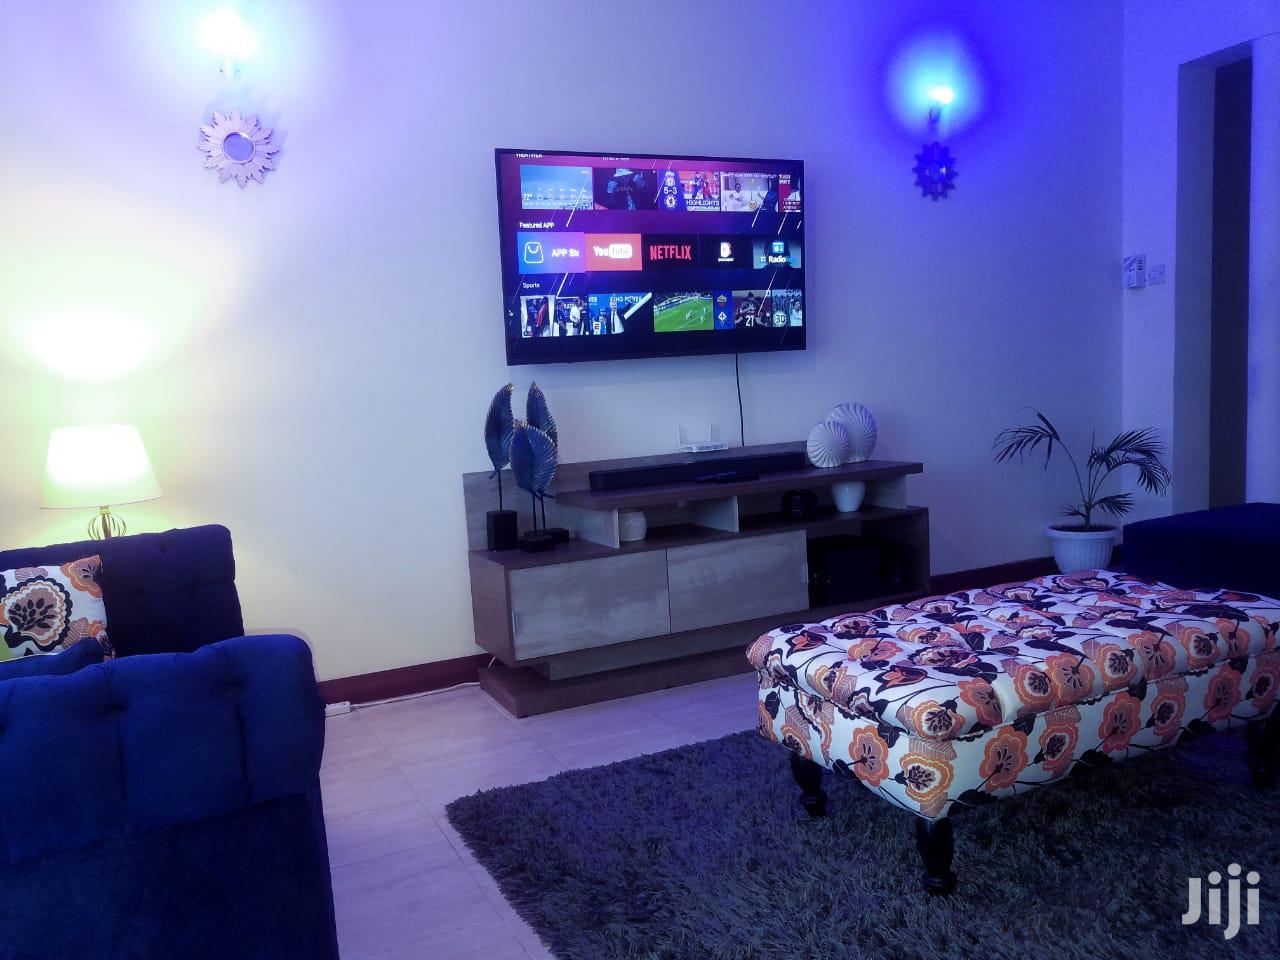 3 Bedrooms Furnished Apartment In Nyali | Short Let for sale in Nyali, Mombasa, Kenya